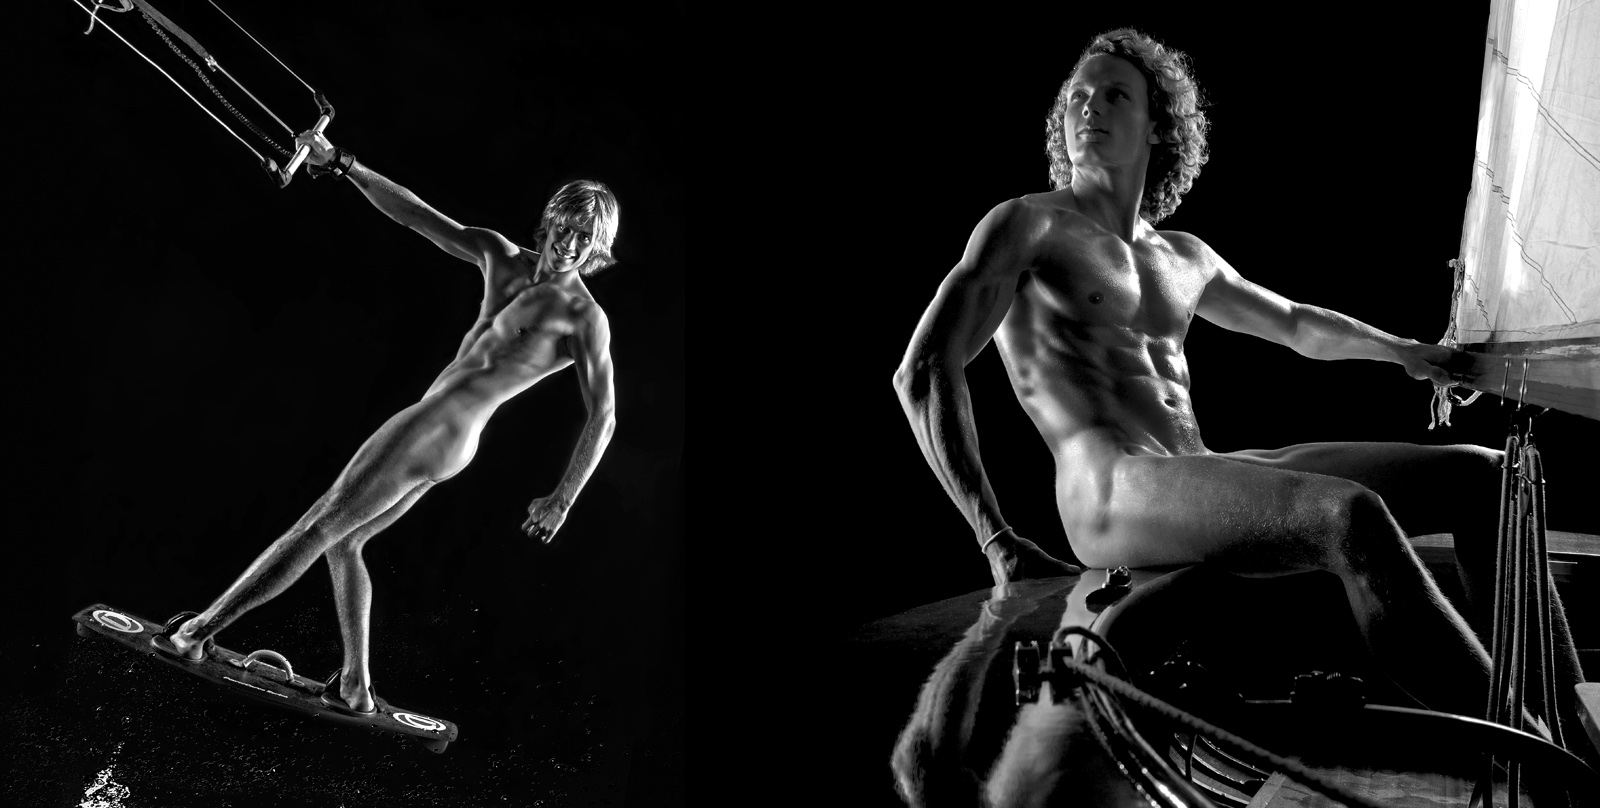 Nackt leben projekt blowjob photo